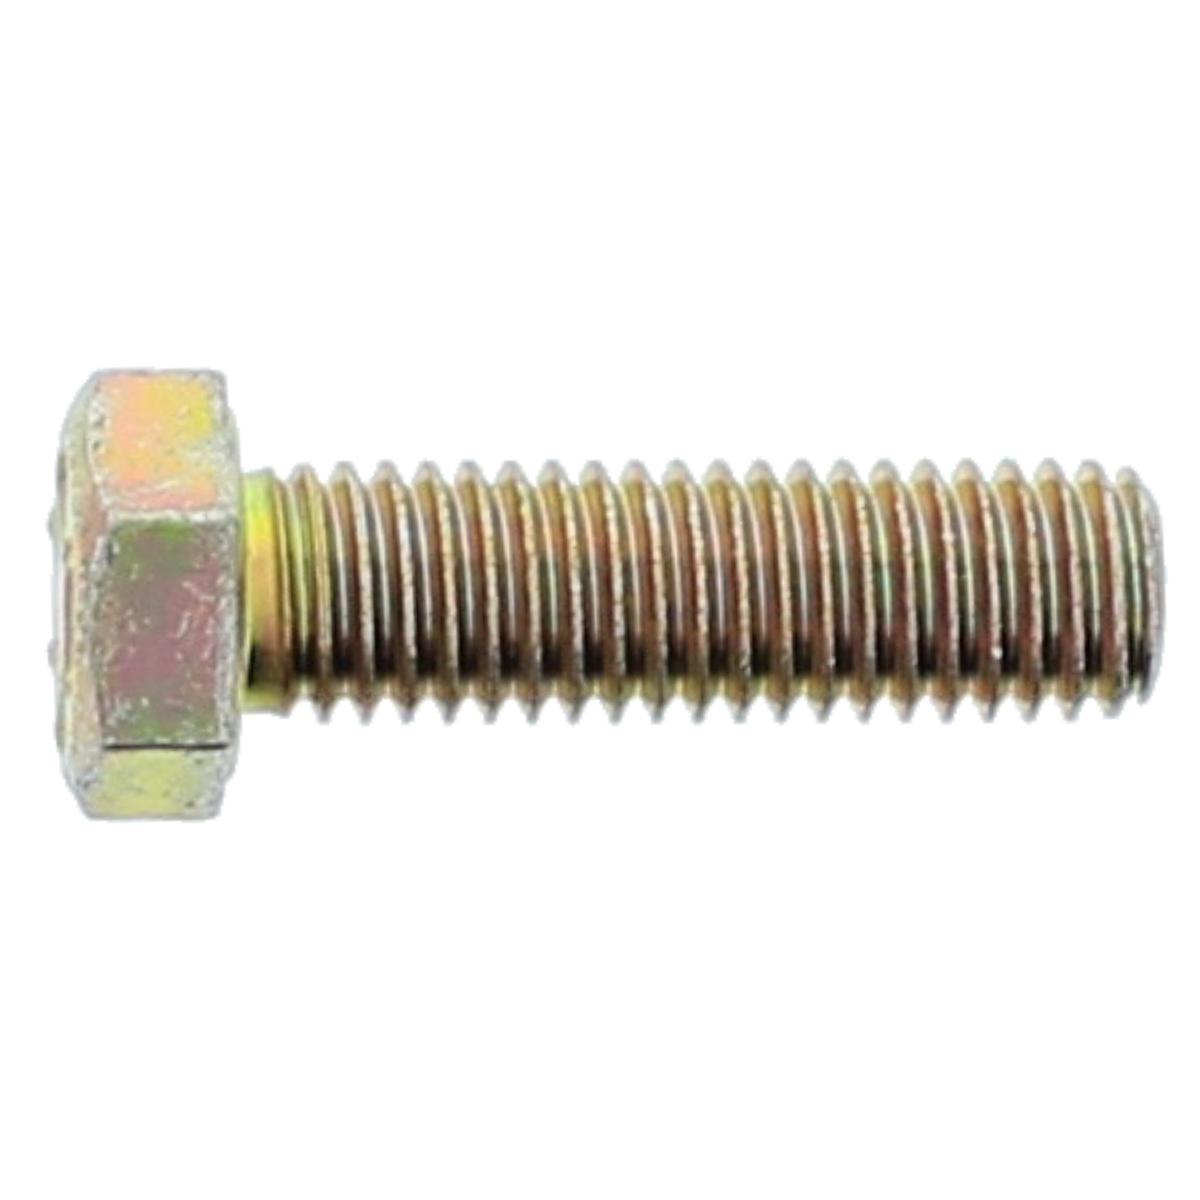 "1-1/4""-7 x 2-1/2"" Hex Cap Screws — SAE J429 Grade 8, Coarse Thread, Zinc Yellow, 1/PKG"